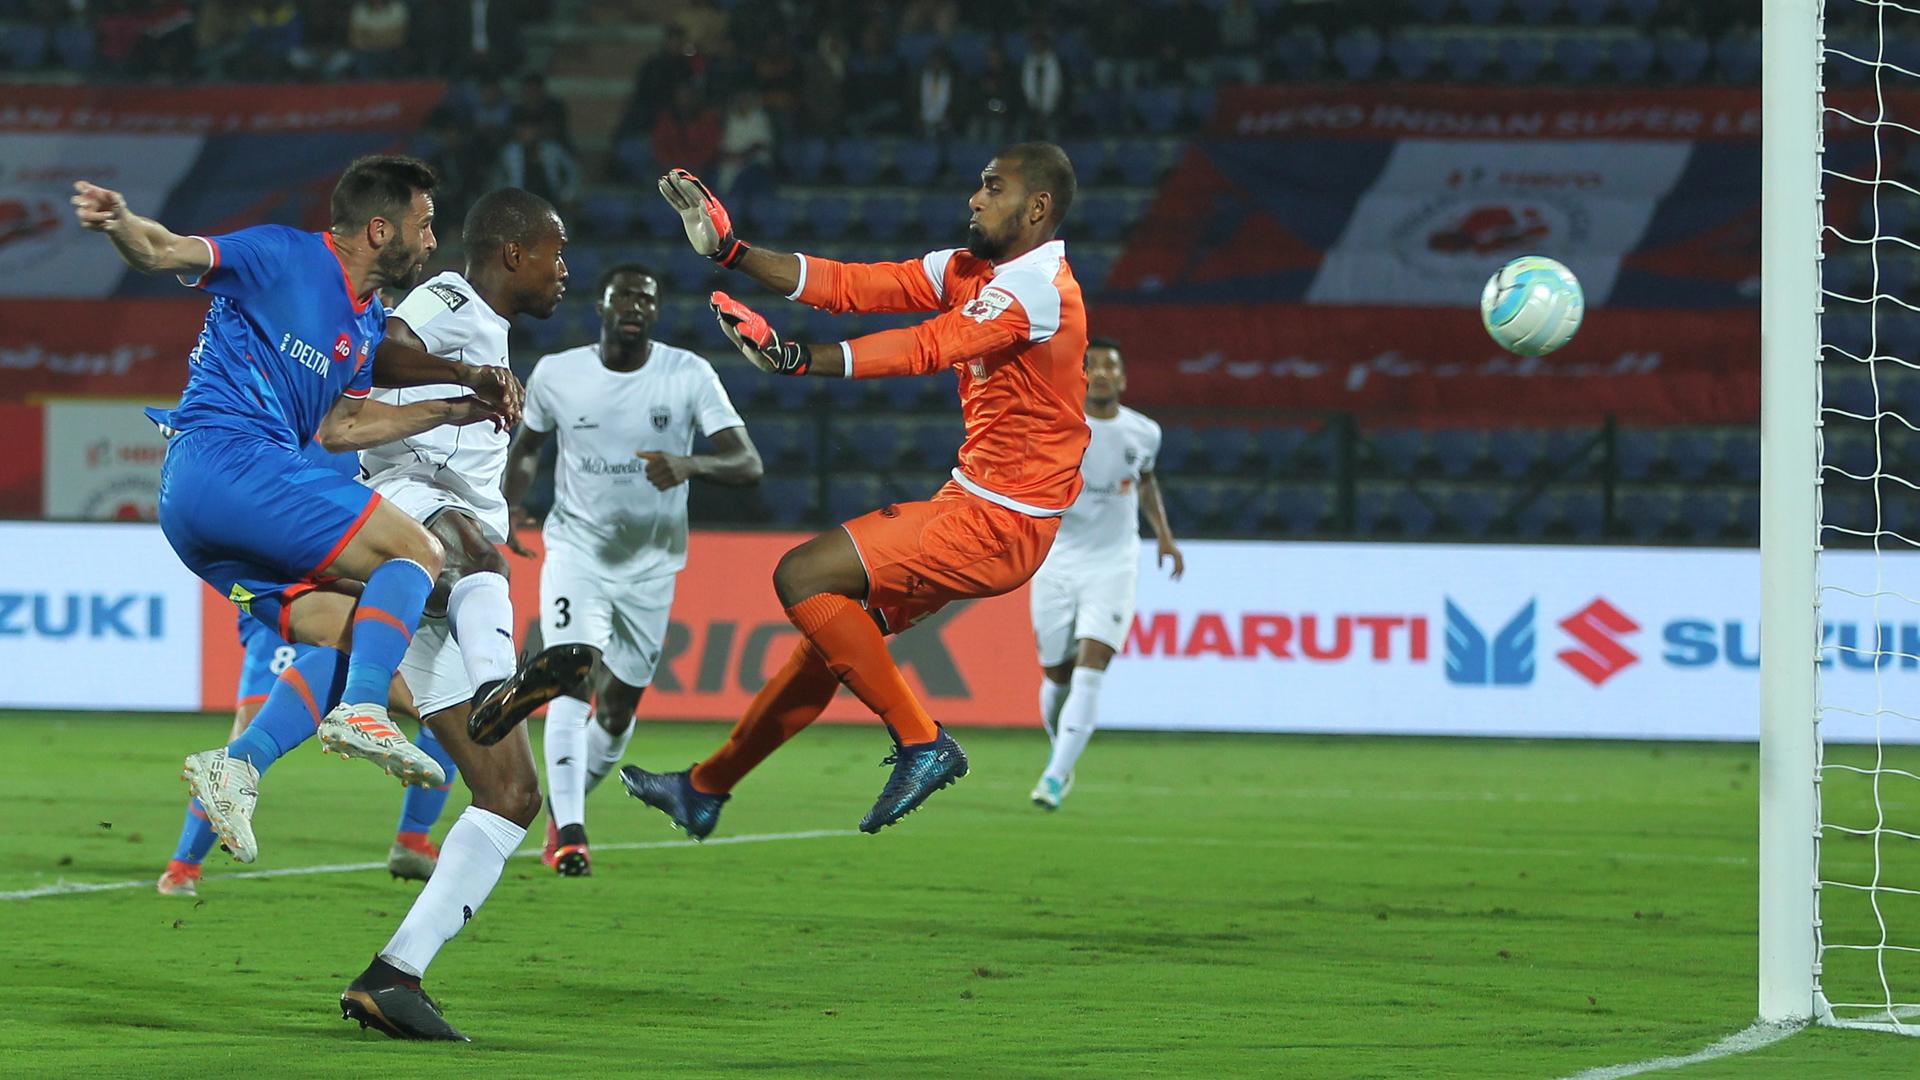 NorthEast United FC FC Goa ISL 4 2017/2018